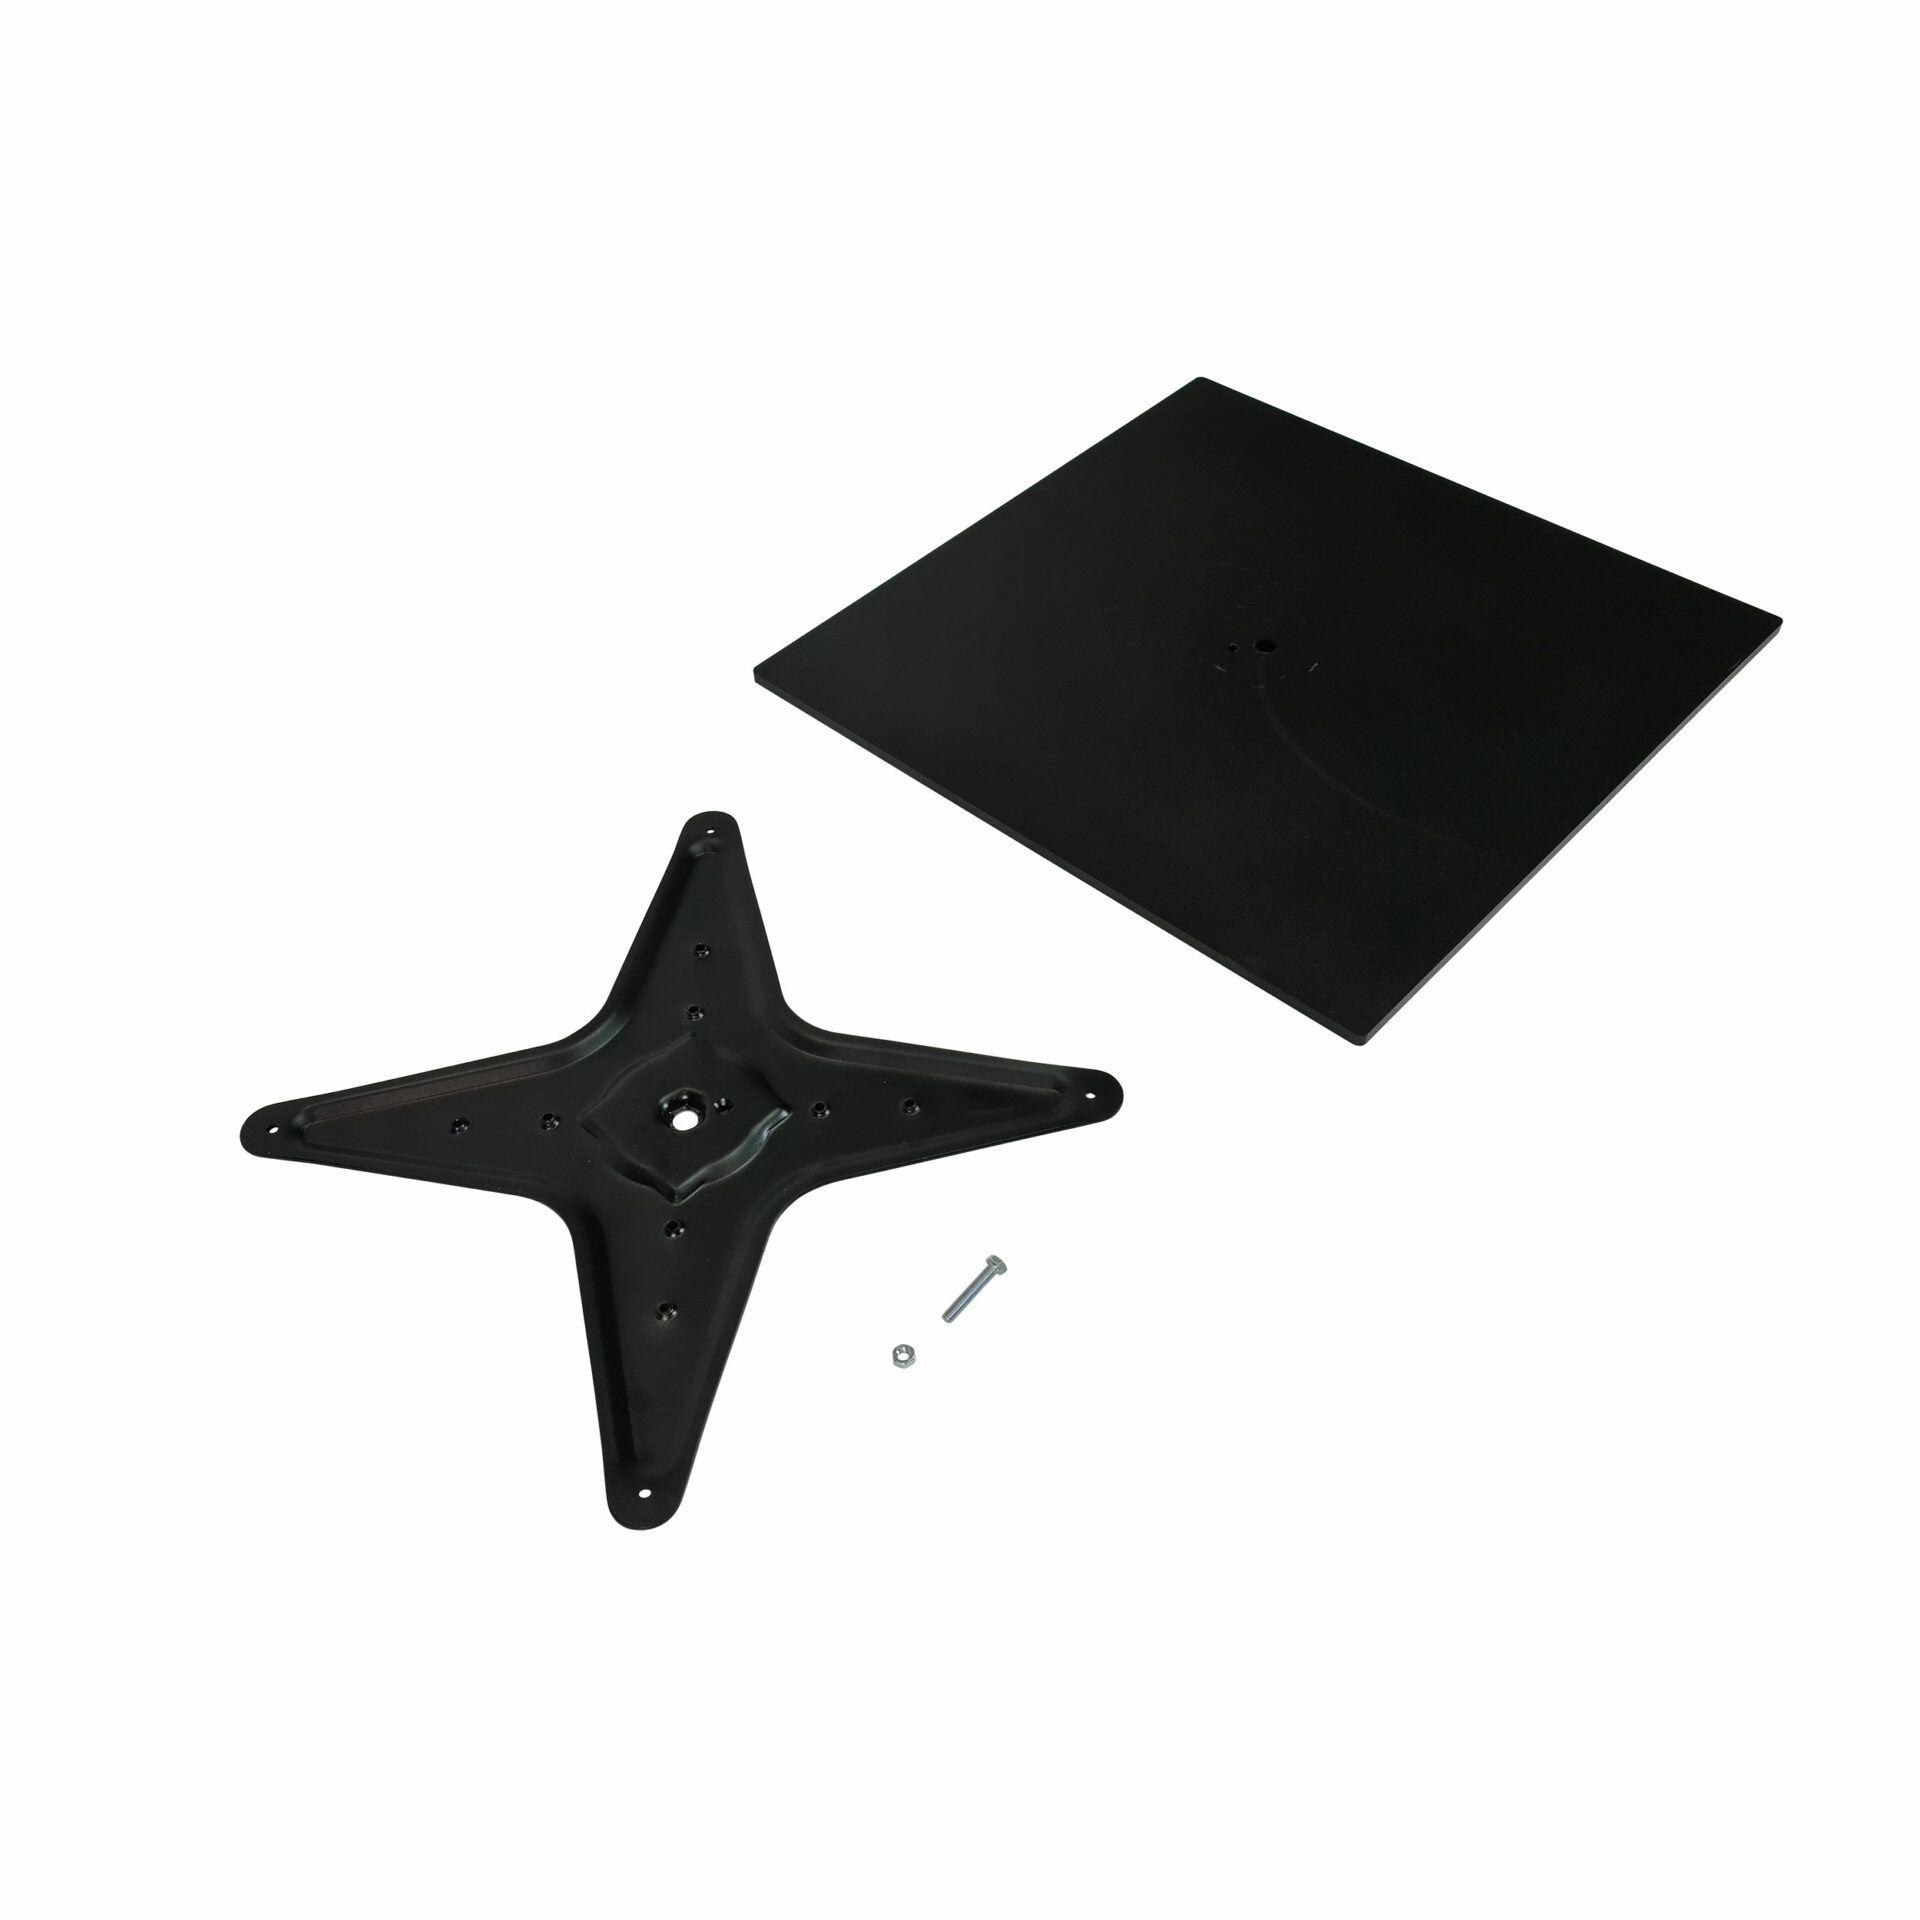 calais table base black.parts